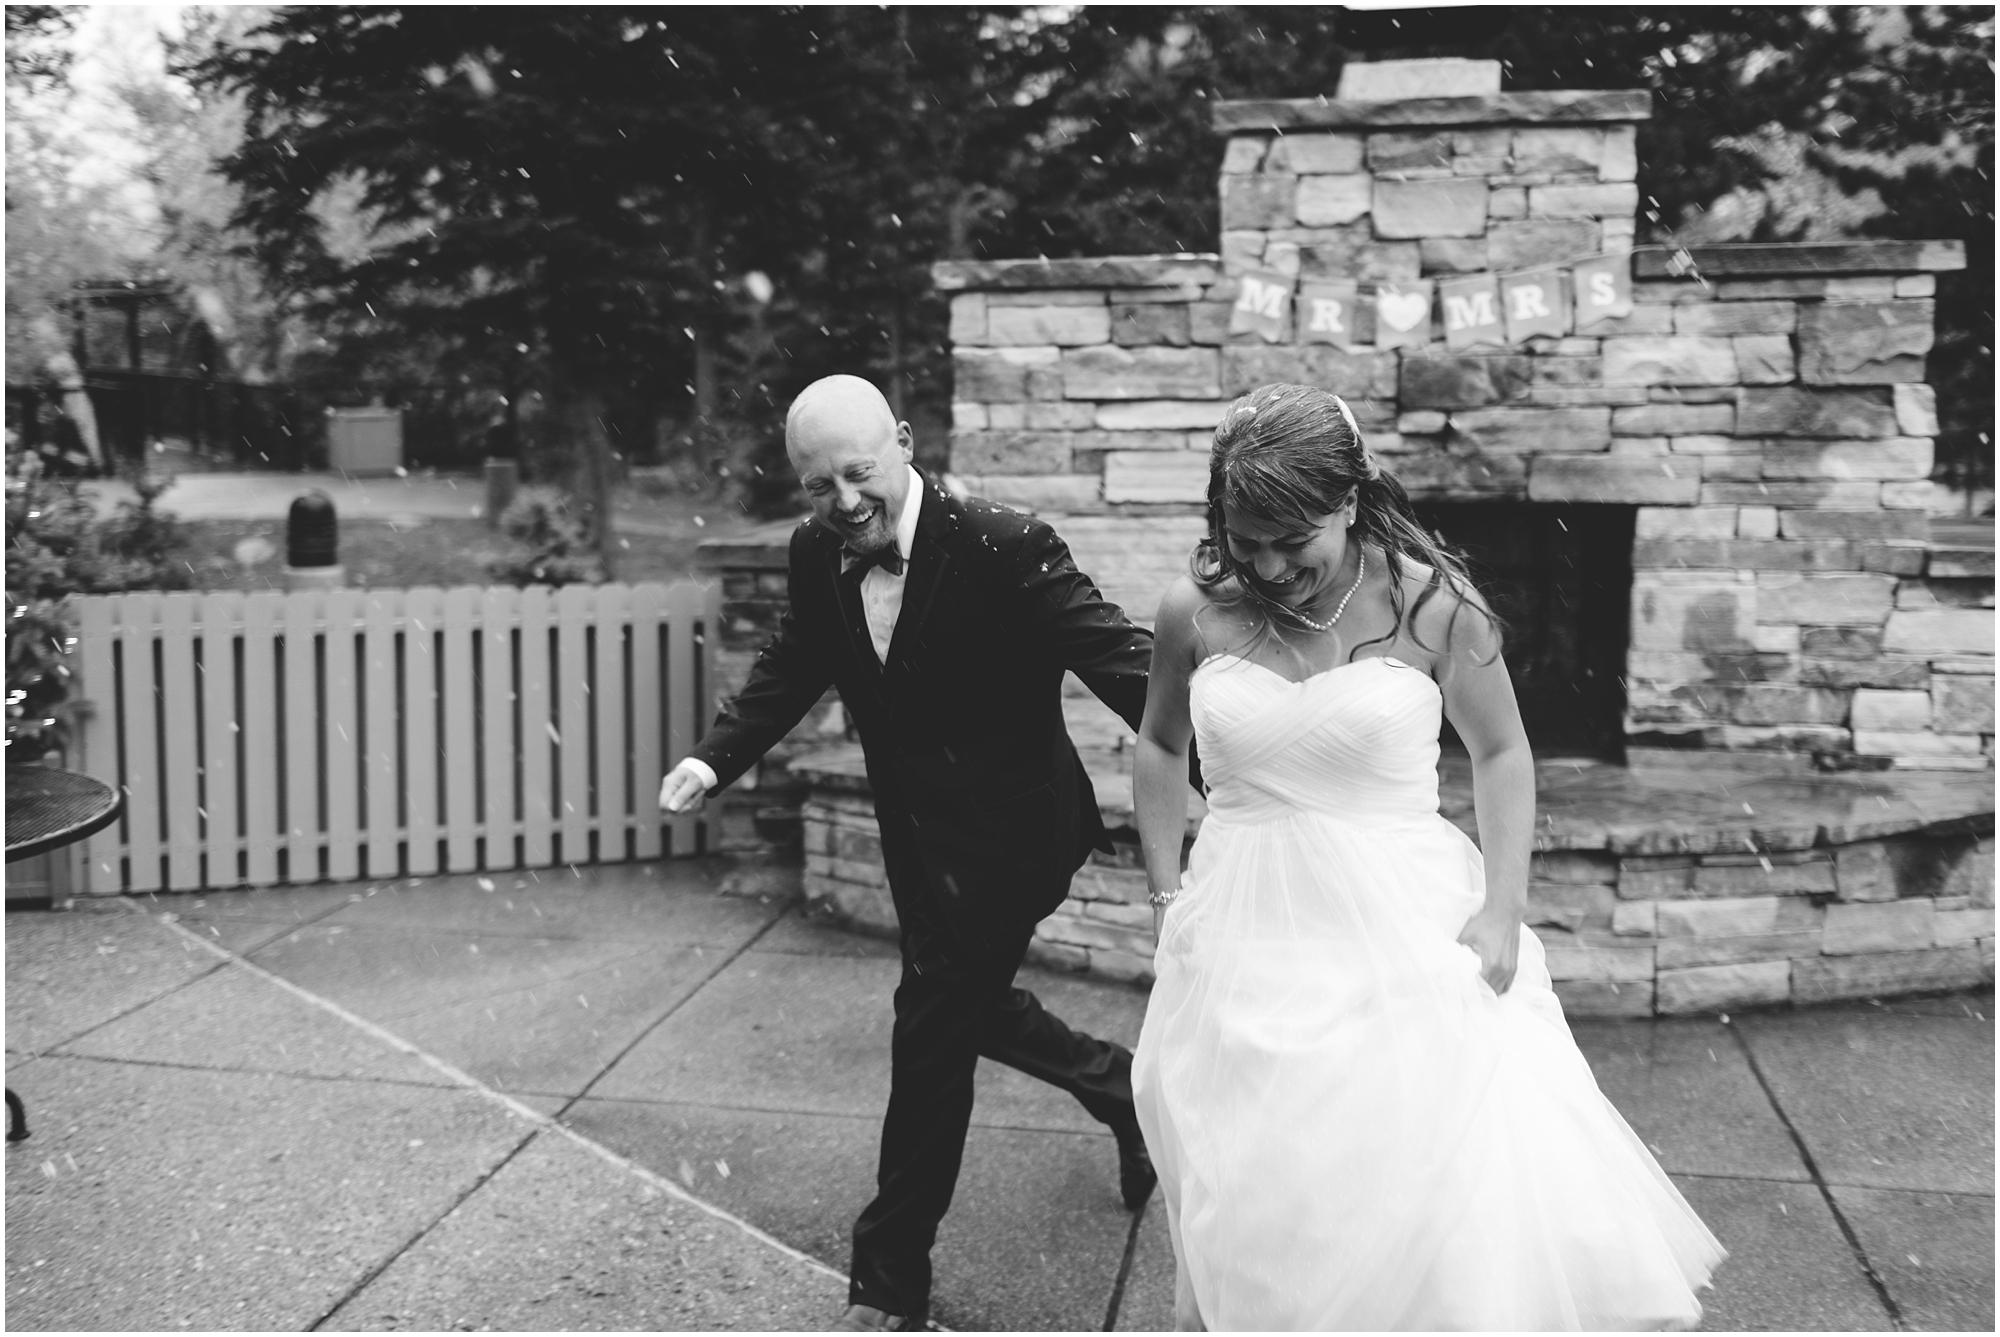 ©Taylor Powers_Shanna+Chris_Wedding_226.jpg